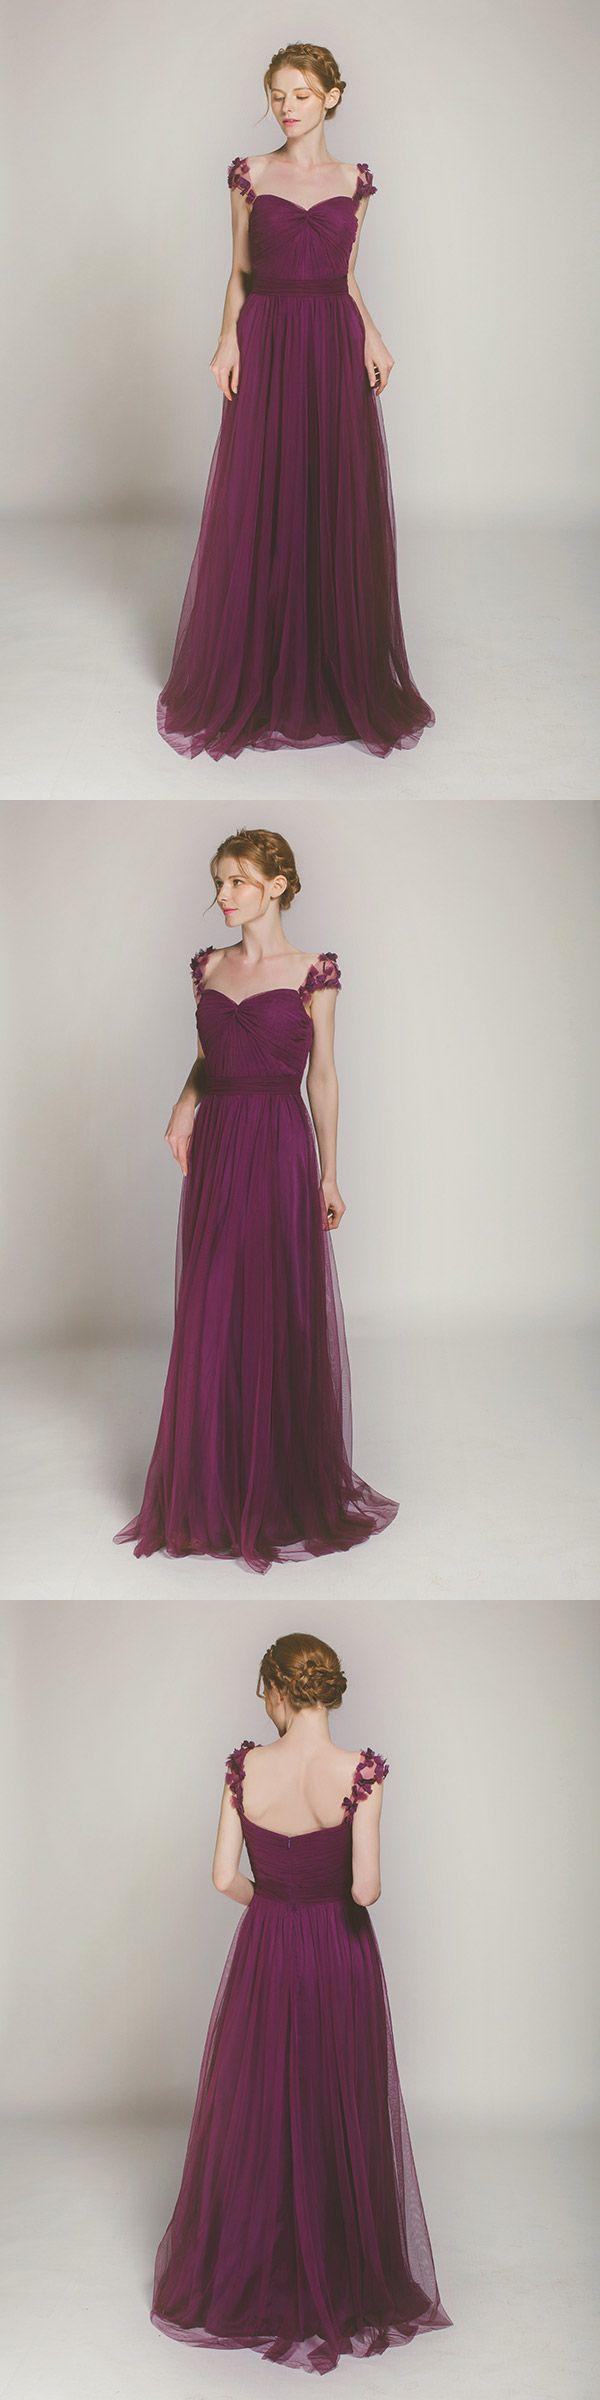 aubergine long tulle bridesmaid dresses for purple themed weddings